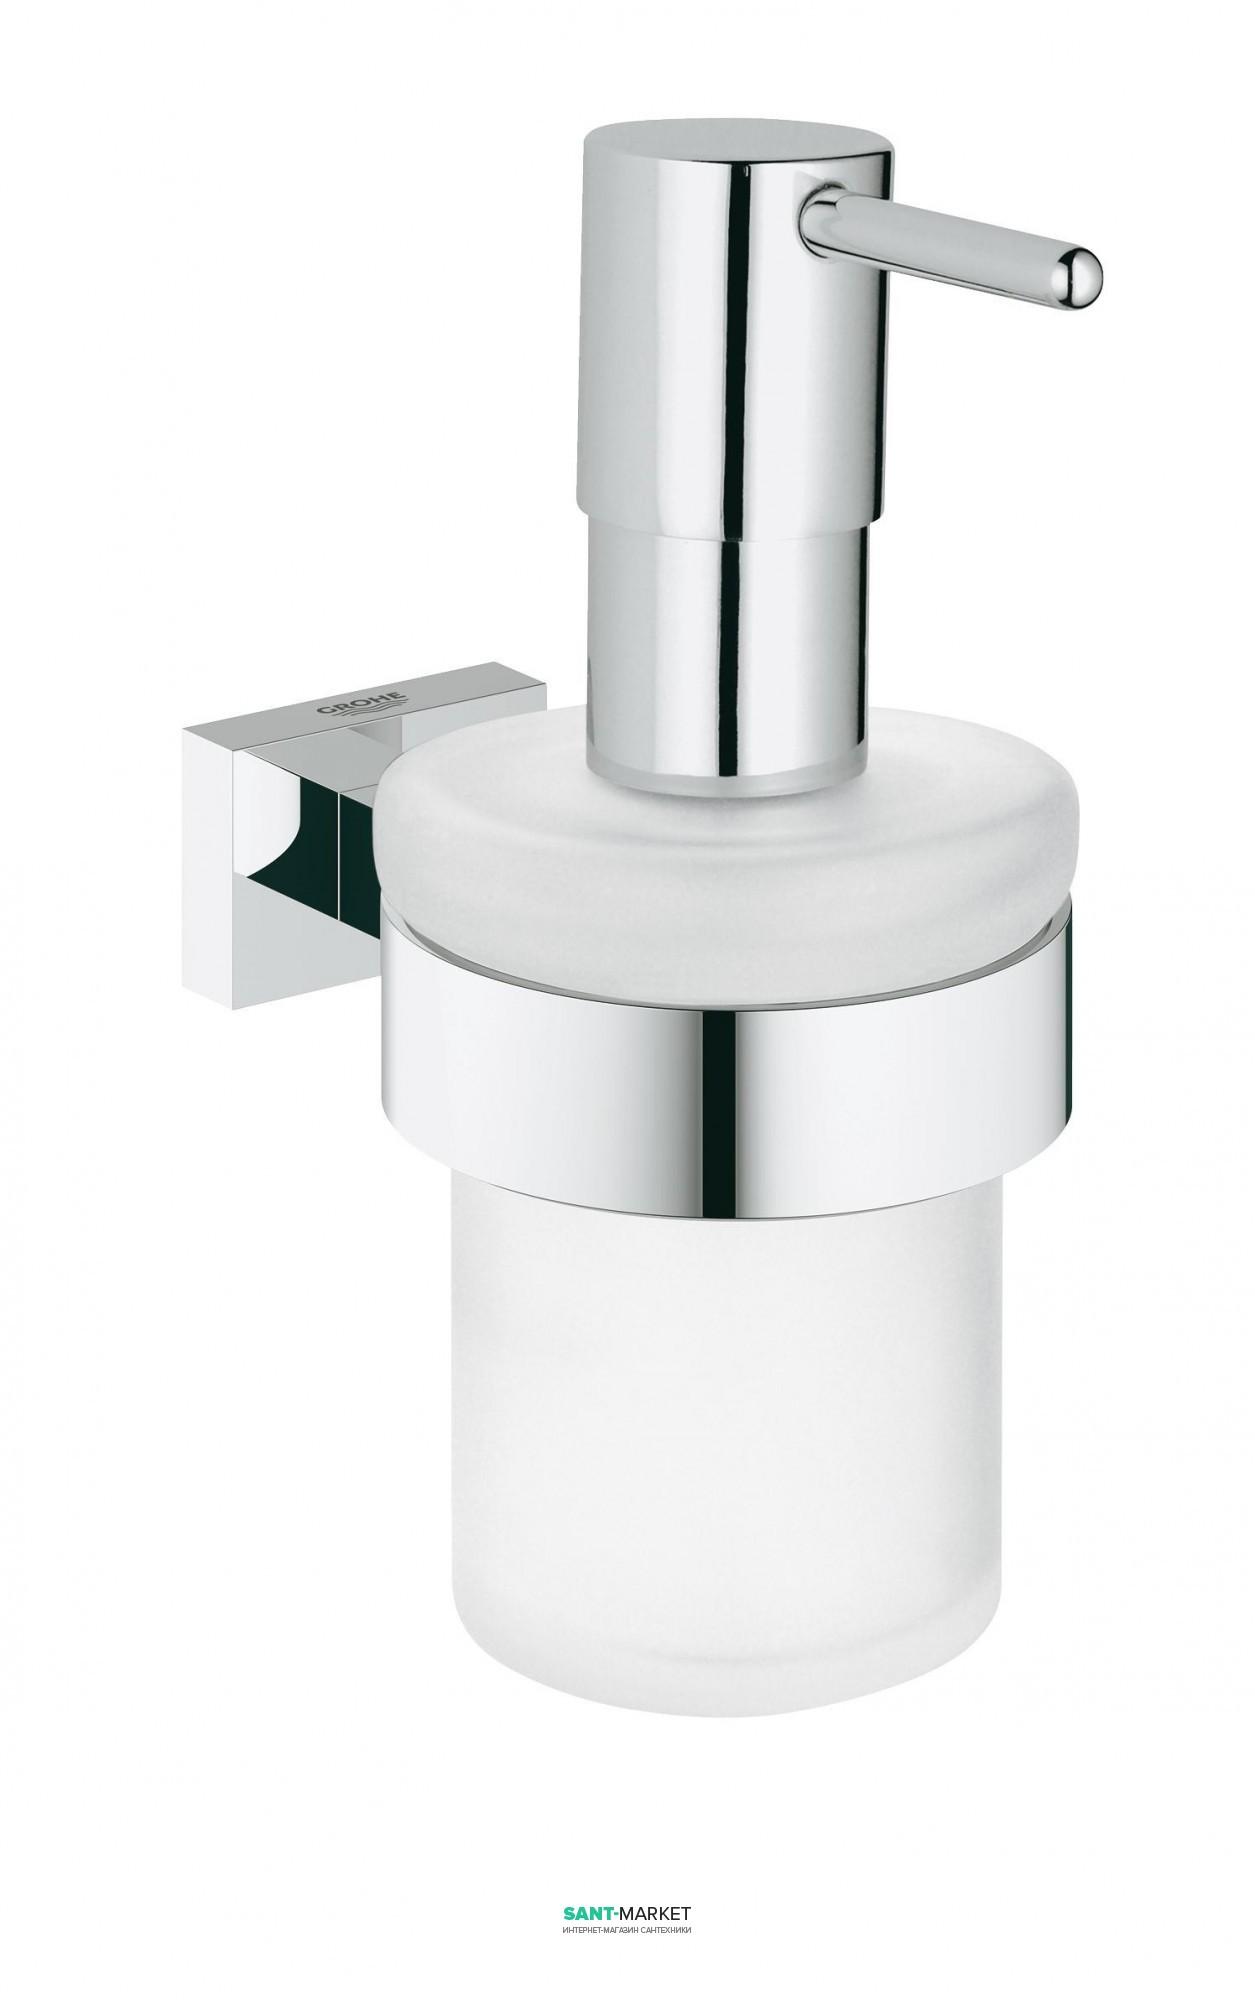 grohe Дозатор жидкого мыла с держателем Grohe Essentials Cube хром 40756001